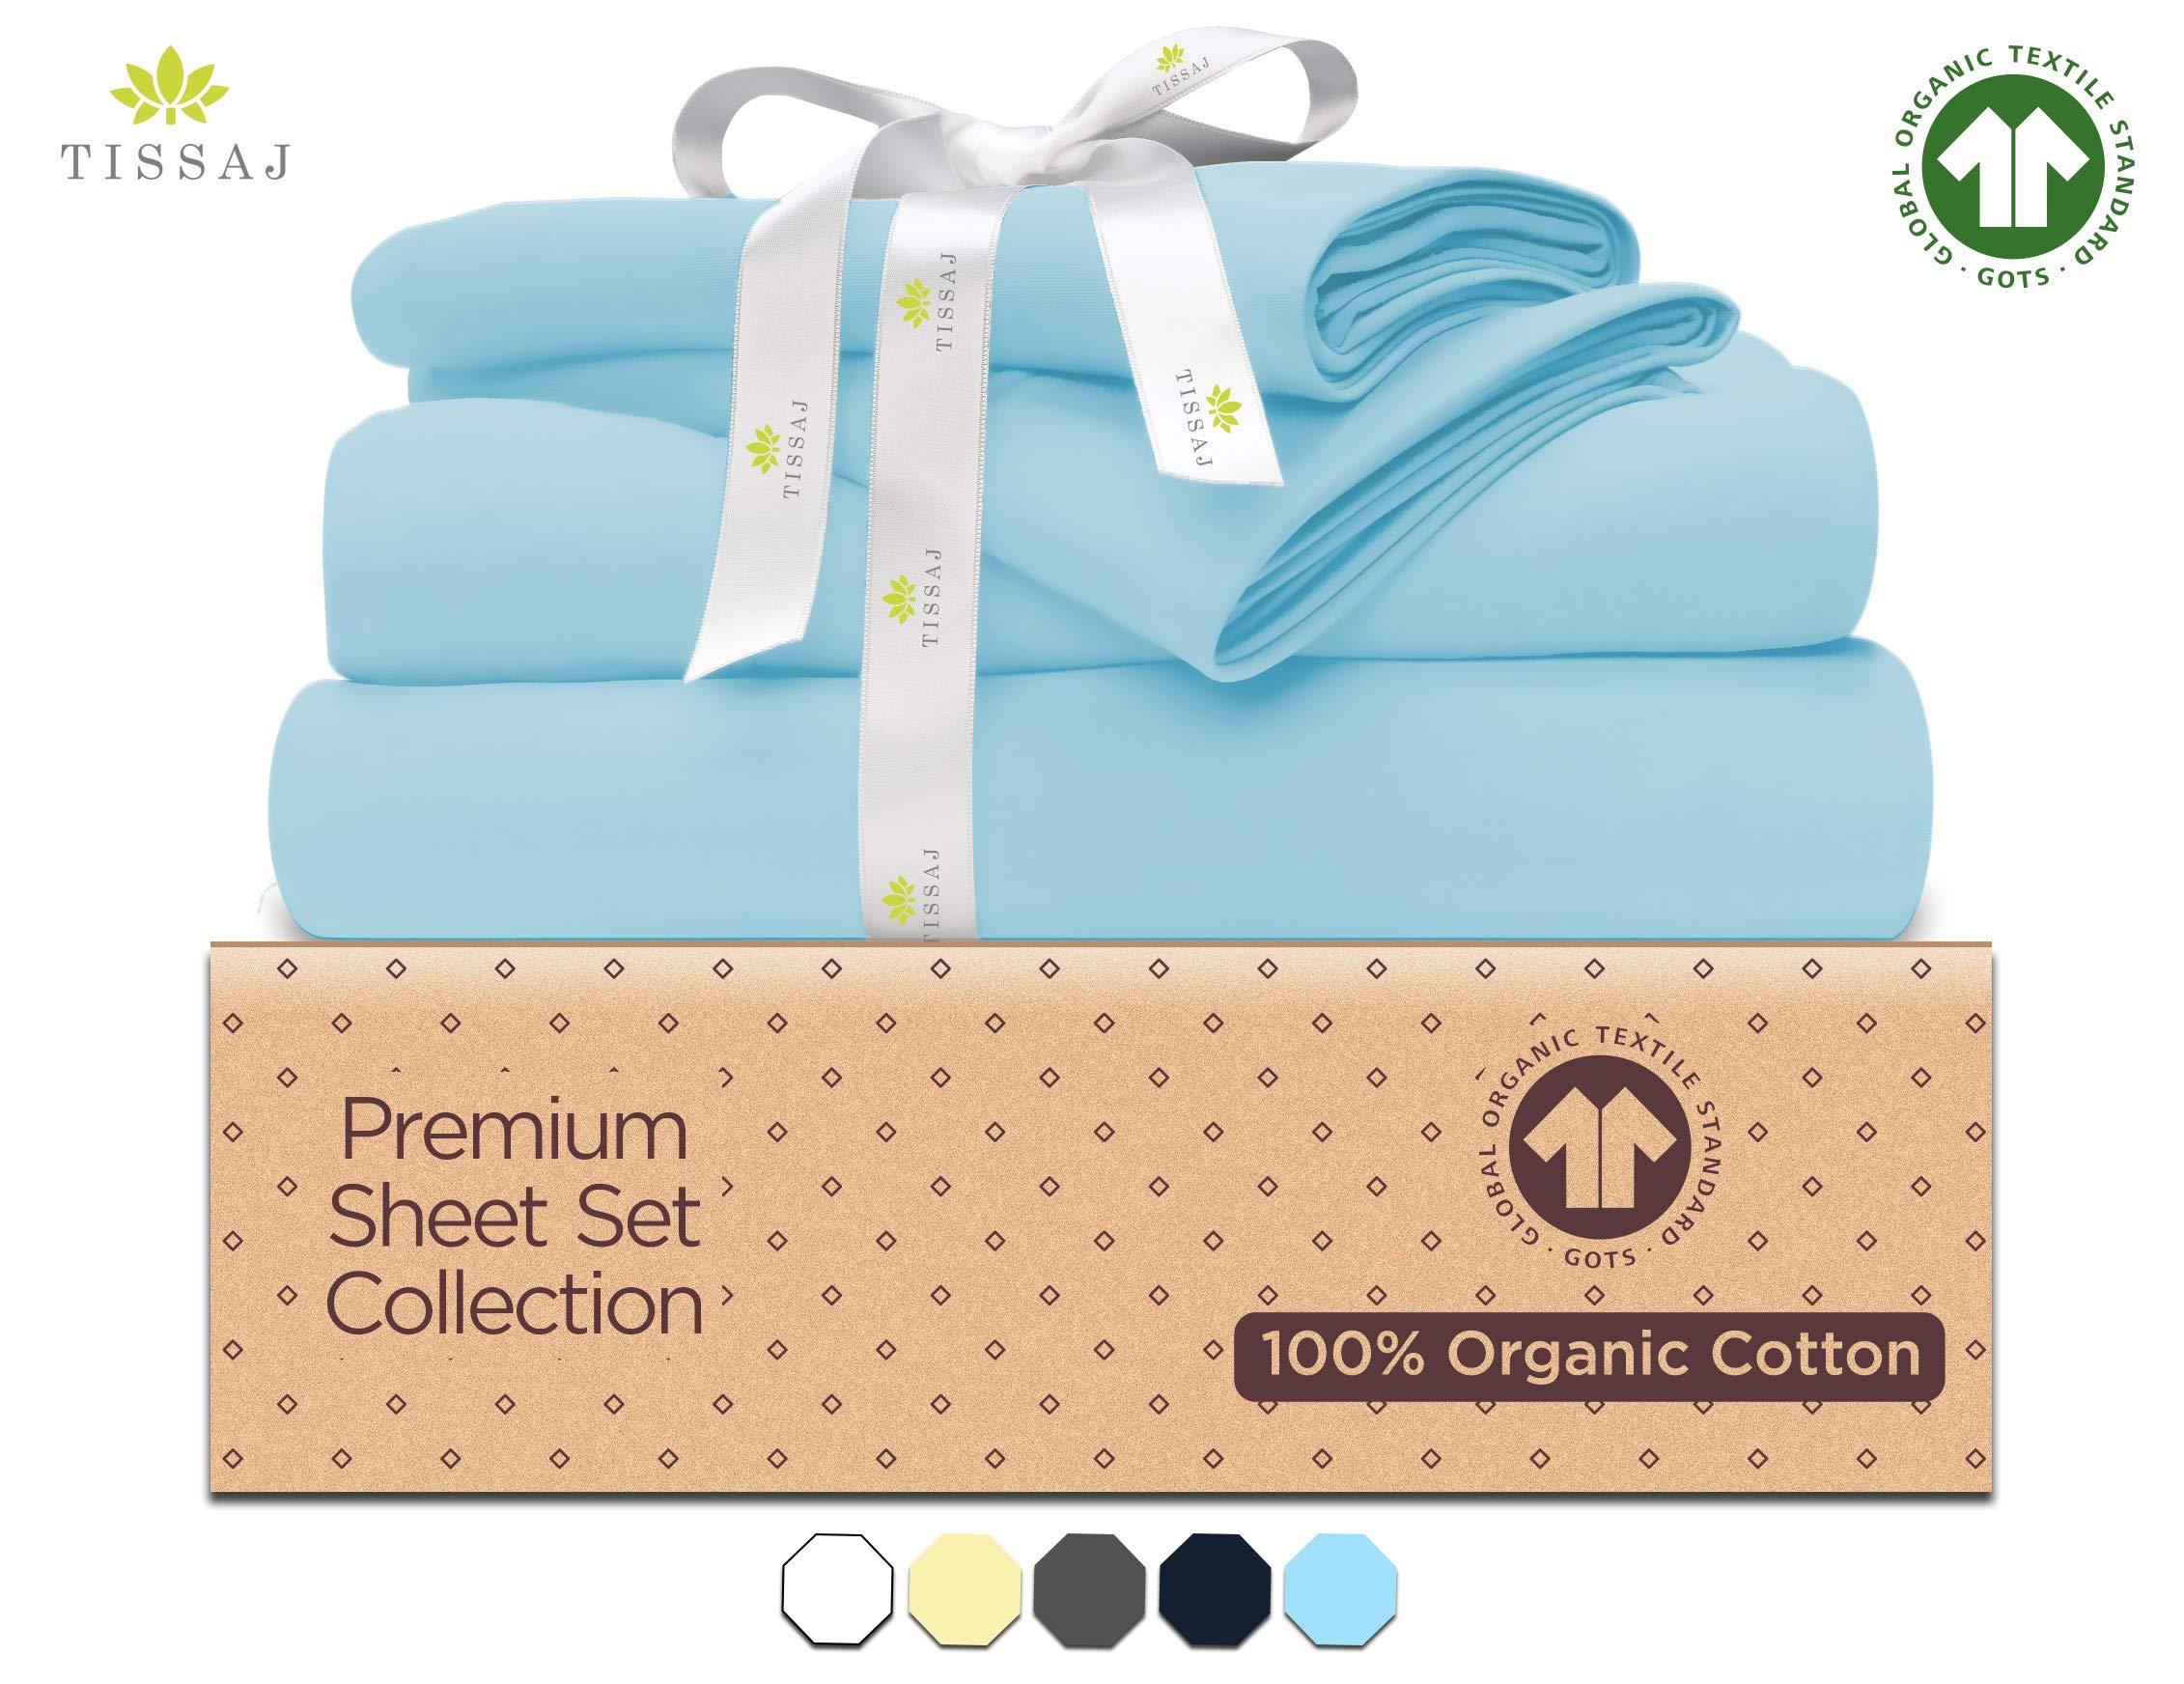 "500-Thread-Count Organic Cotton Bed Sheets - Set - 500TC King Size Ice Blue - 4 Piece Bedding - 100% GOTS Certified Extra Long Staple, Soft Sateen Weave Finish Bedsheet - Fits 15"" Deep Pocket Mattress"